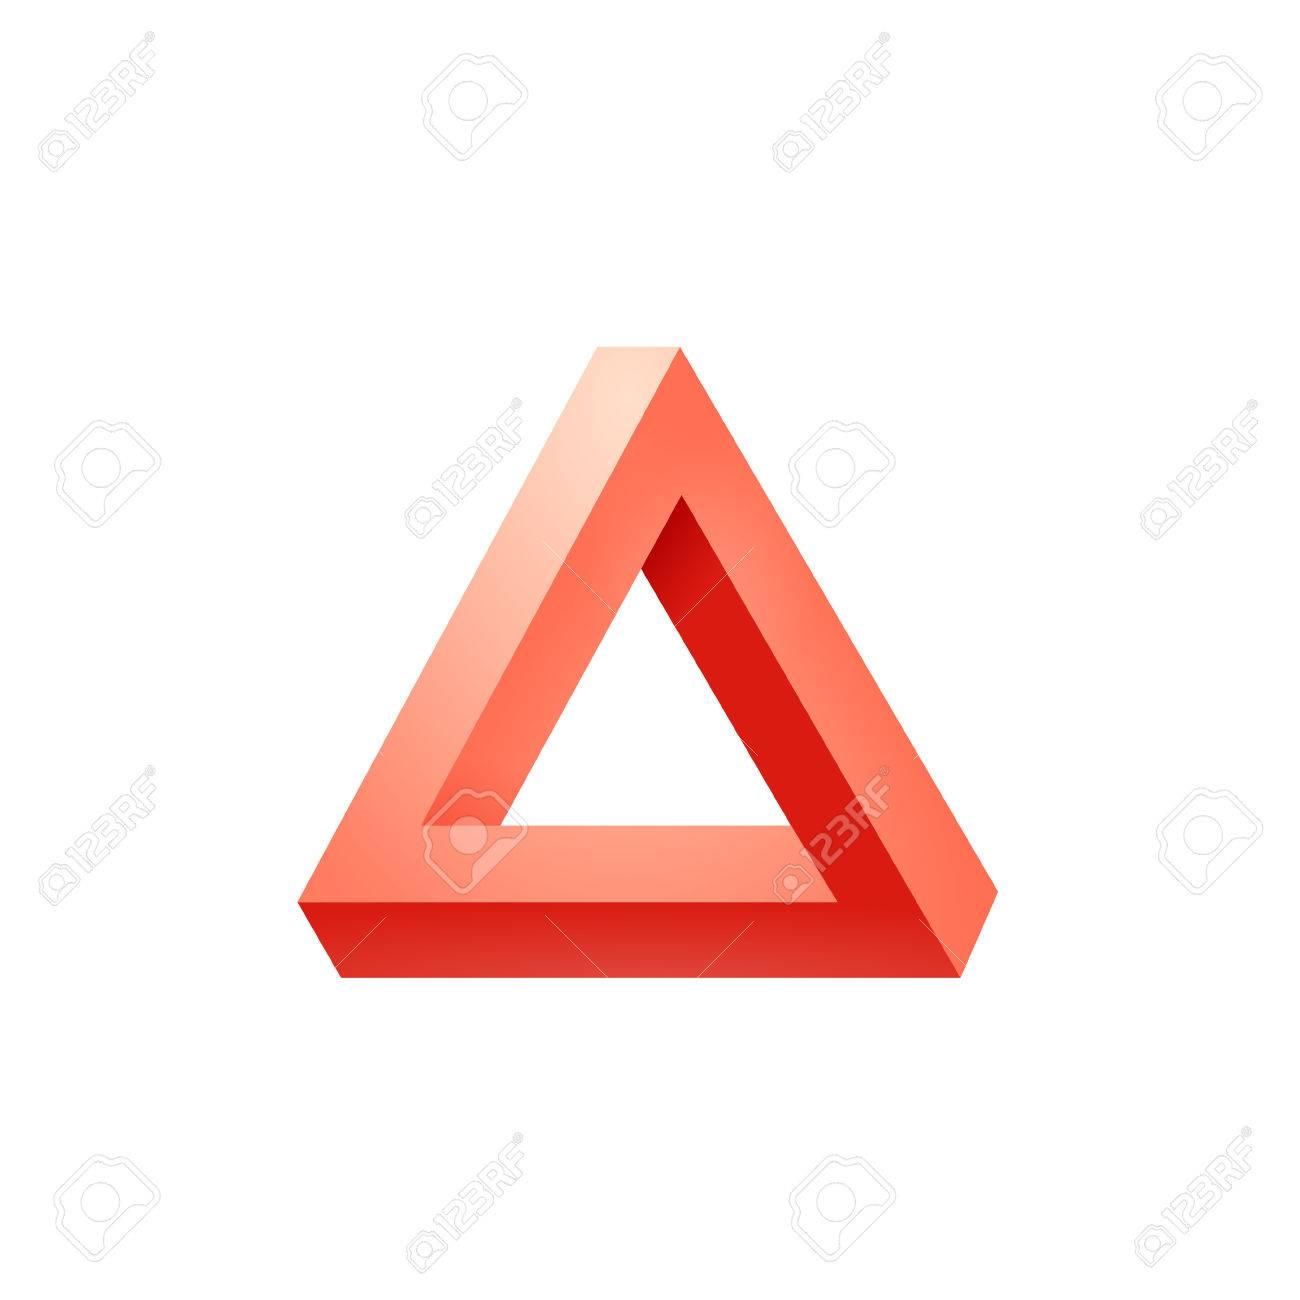 Penrose triangle icon. Impossible triangle shape. Optical Illusion. Vector Illustration isolated on white - 57560164